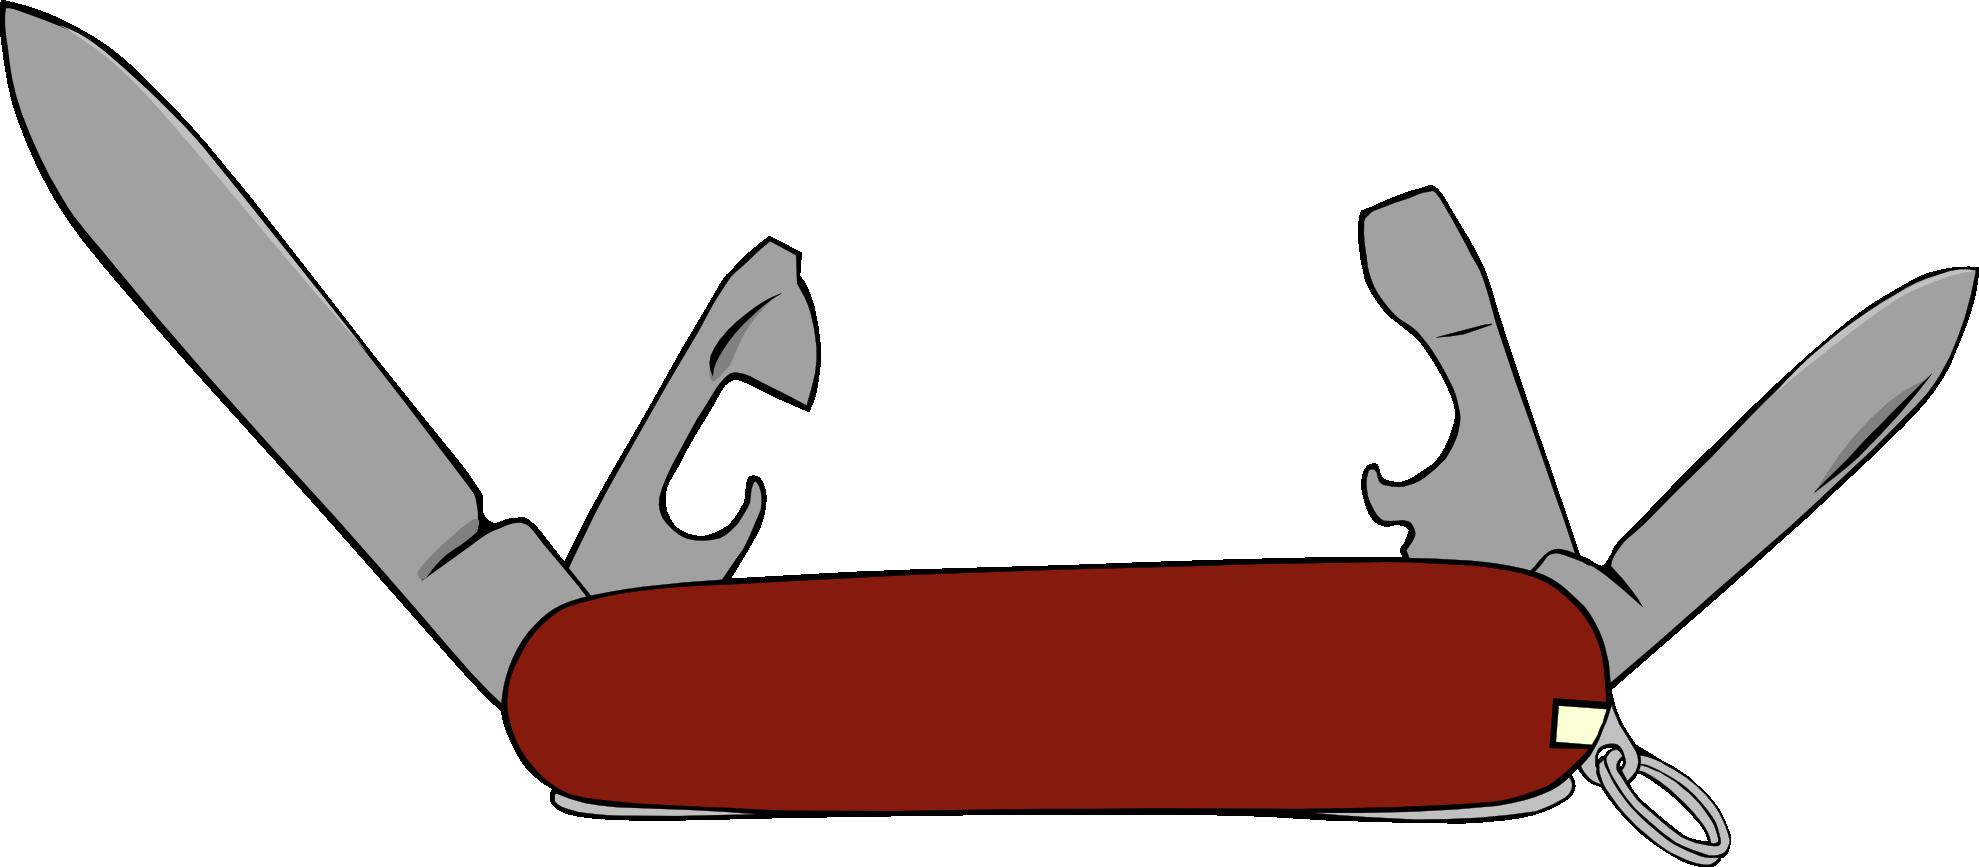 Clip Art Swiss Army Knife 2 Scallywag Clipart Best